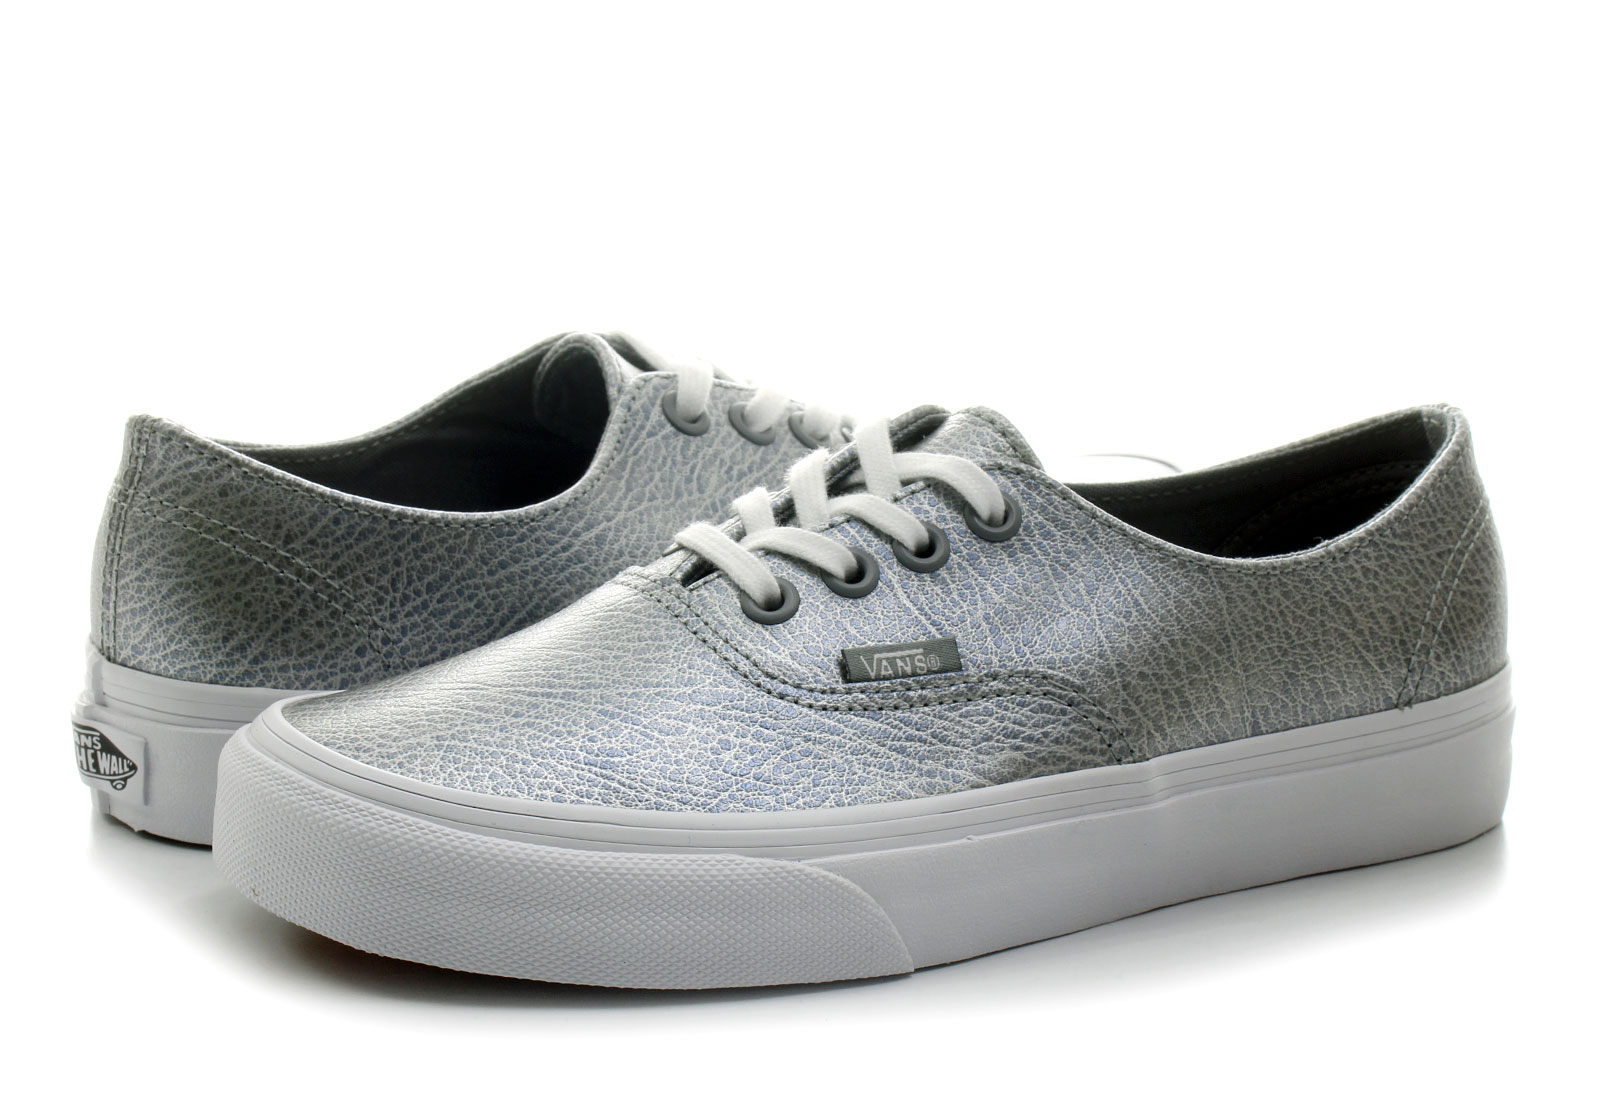 vans sneakers authentic decon v18cit1 online shop. Black Bedroom Furniture Sets. Home Design Ideas